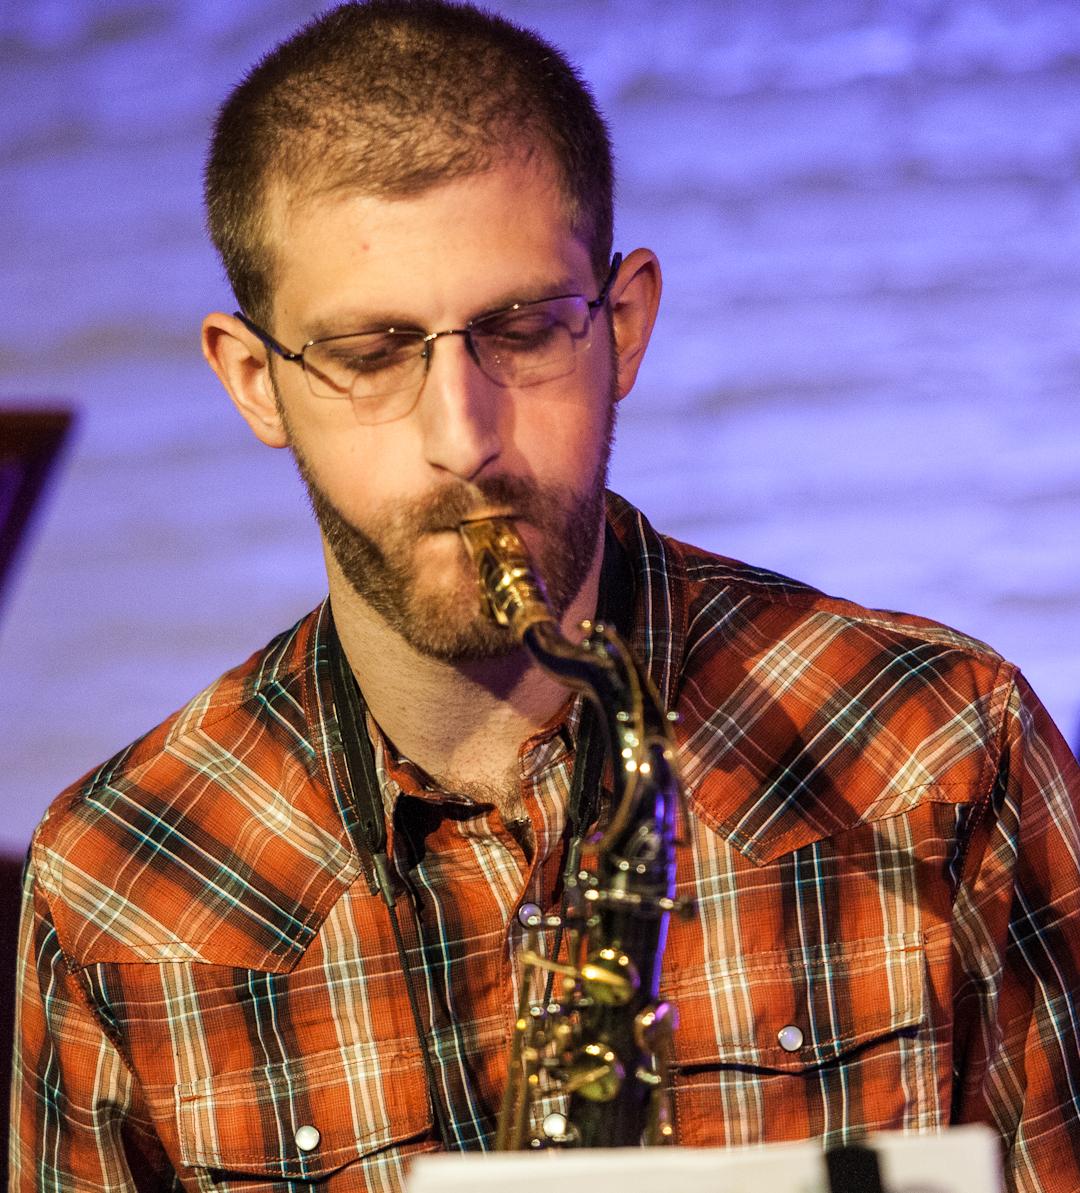 Matt Marantz with Evan Weiss at Inner Circle Music Festival at Shapeshifter Lab